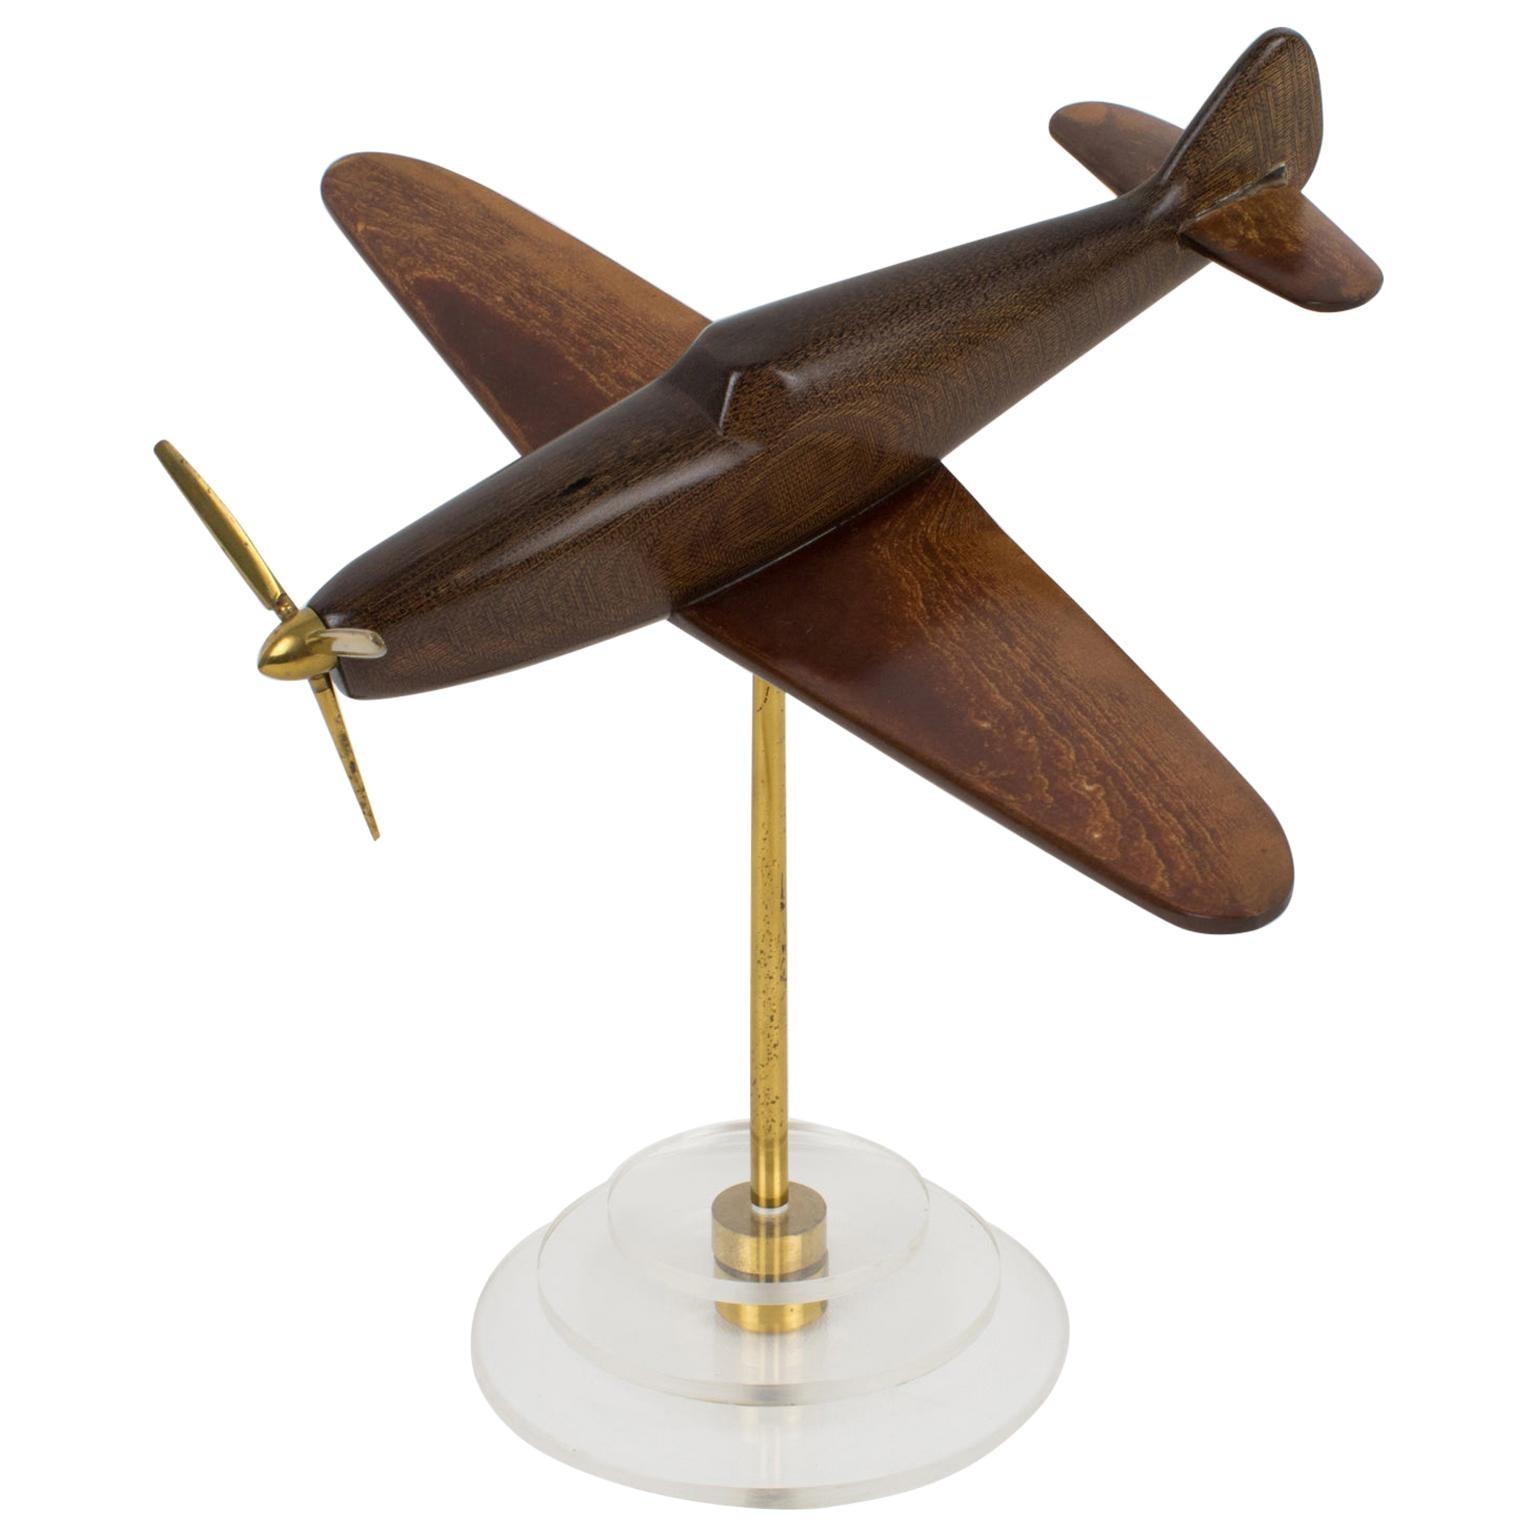 Art Deco Spitfire Bakelite Airplane Aviation Model